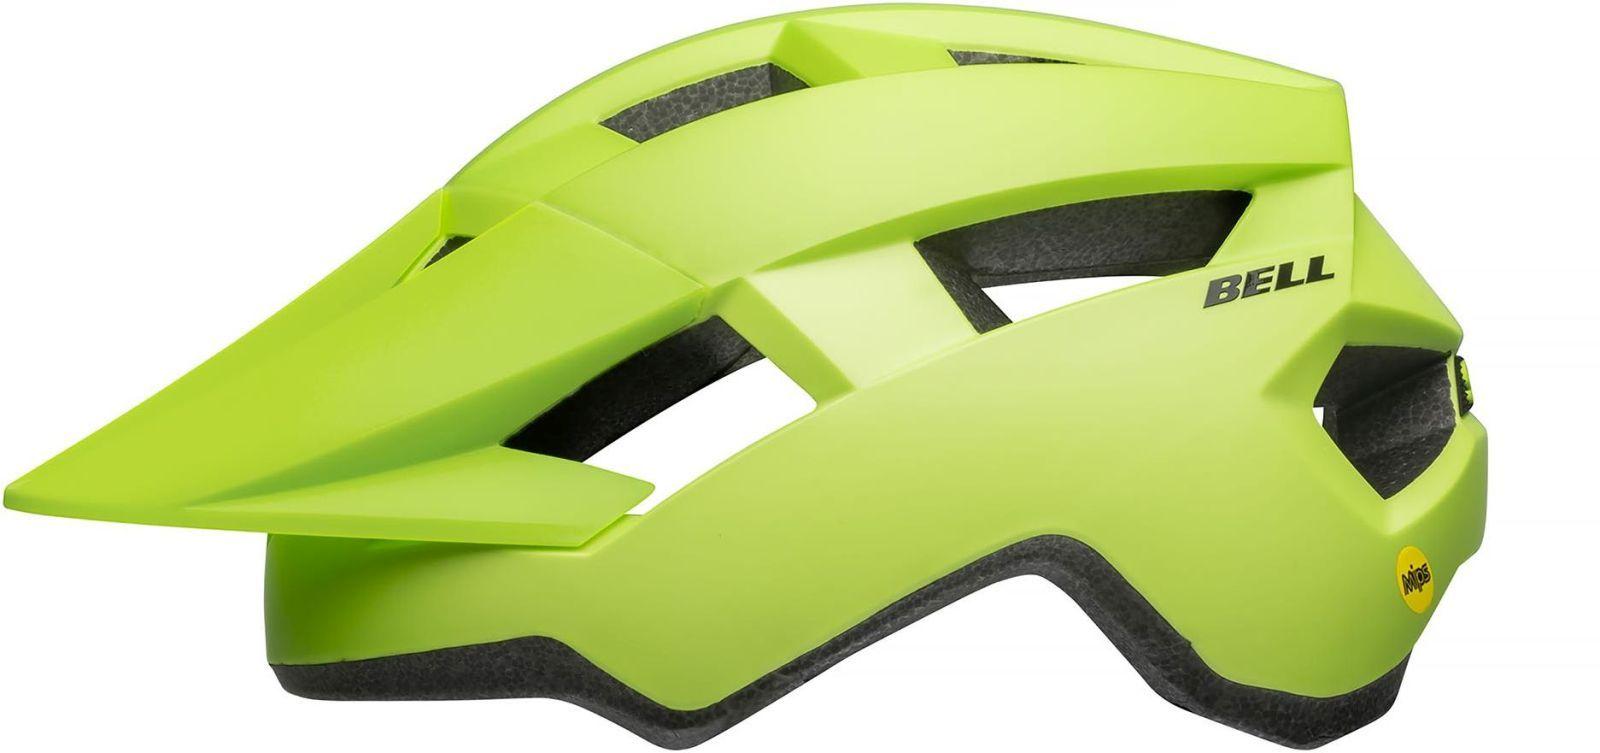 c98148382 Cyklistická helma Bell Spark MIPS - mat bright green/black - Ski a ...